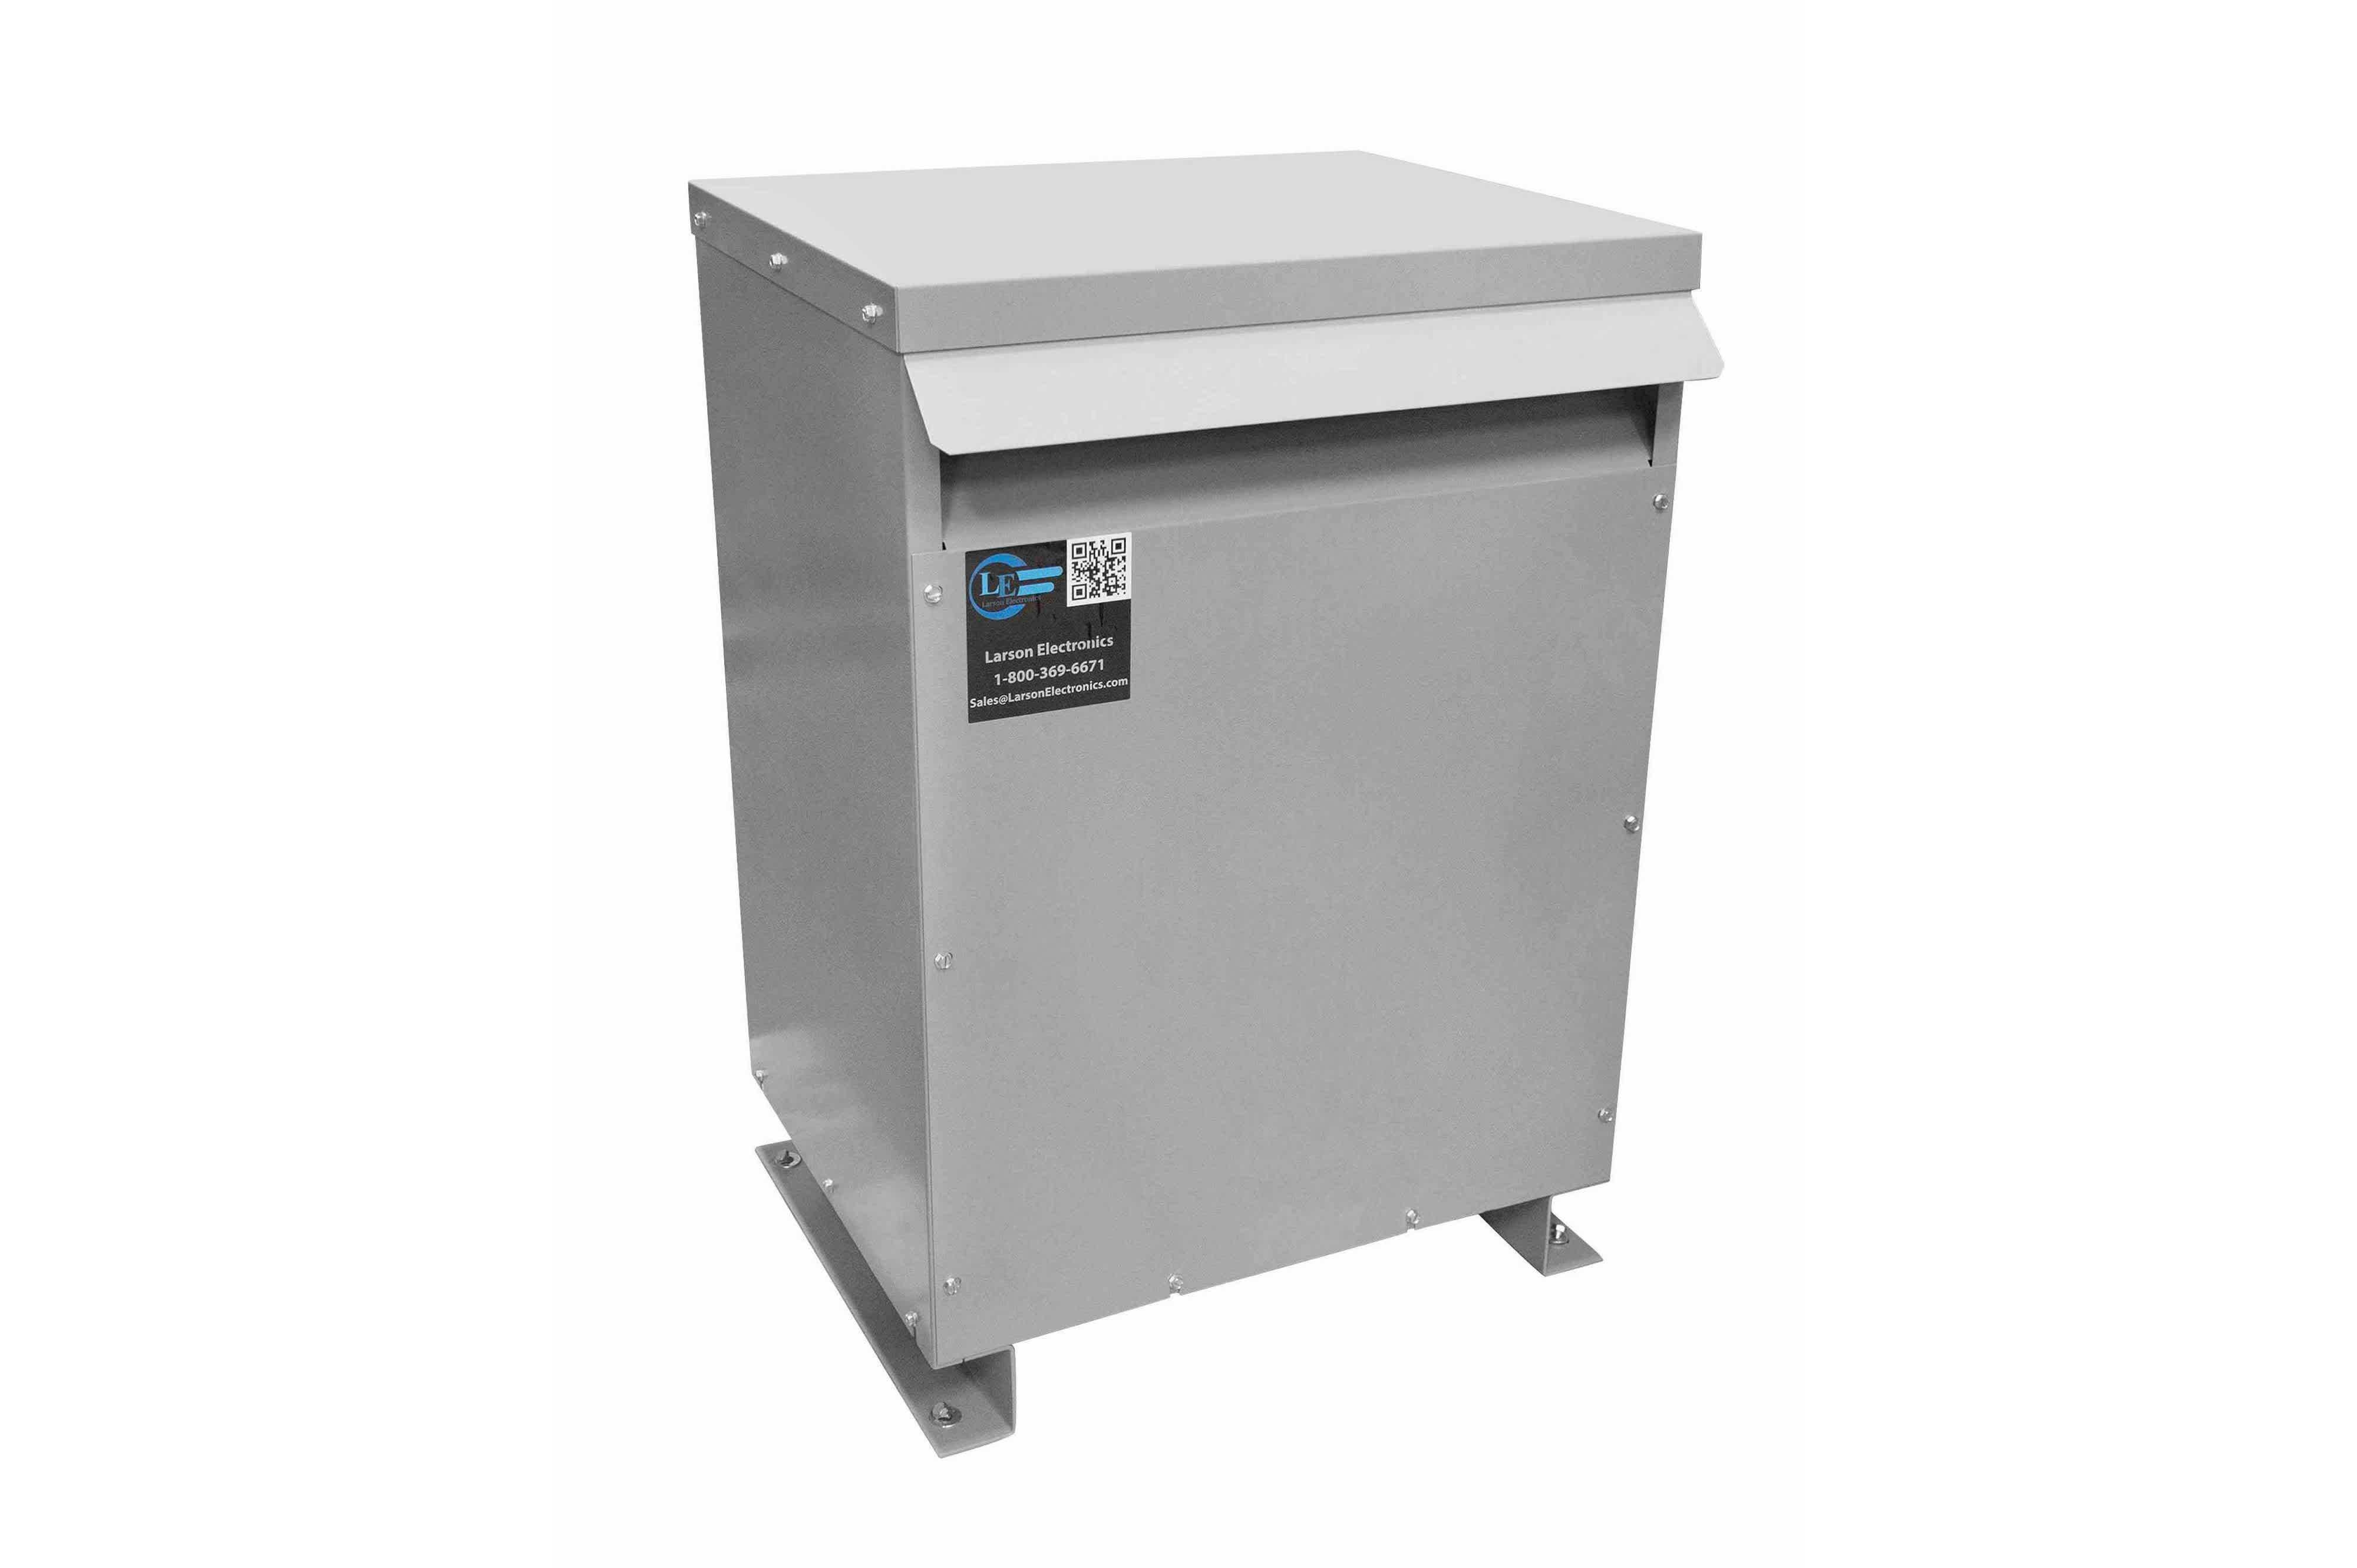 12 kVA 3PH Isolation Transformer, 575V Wye Primary, 400V Delta Secondary, N3R, Ventilated, 60 Hz